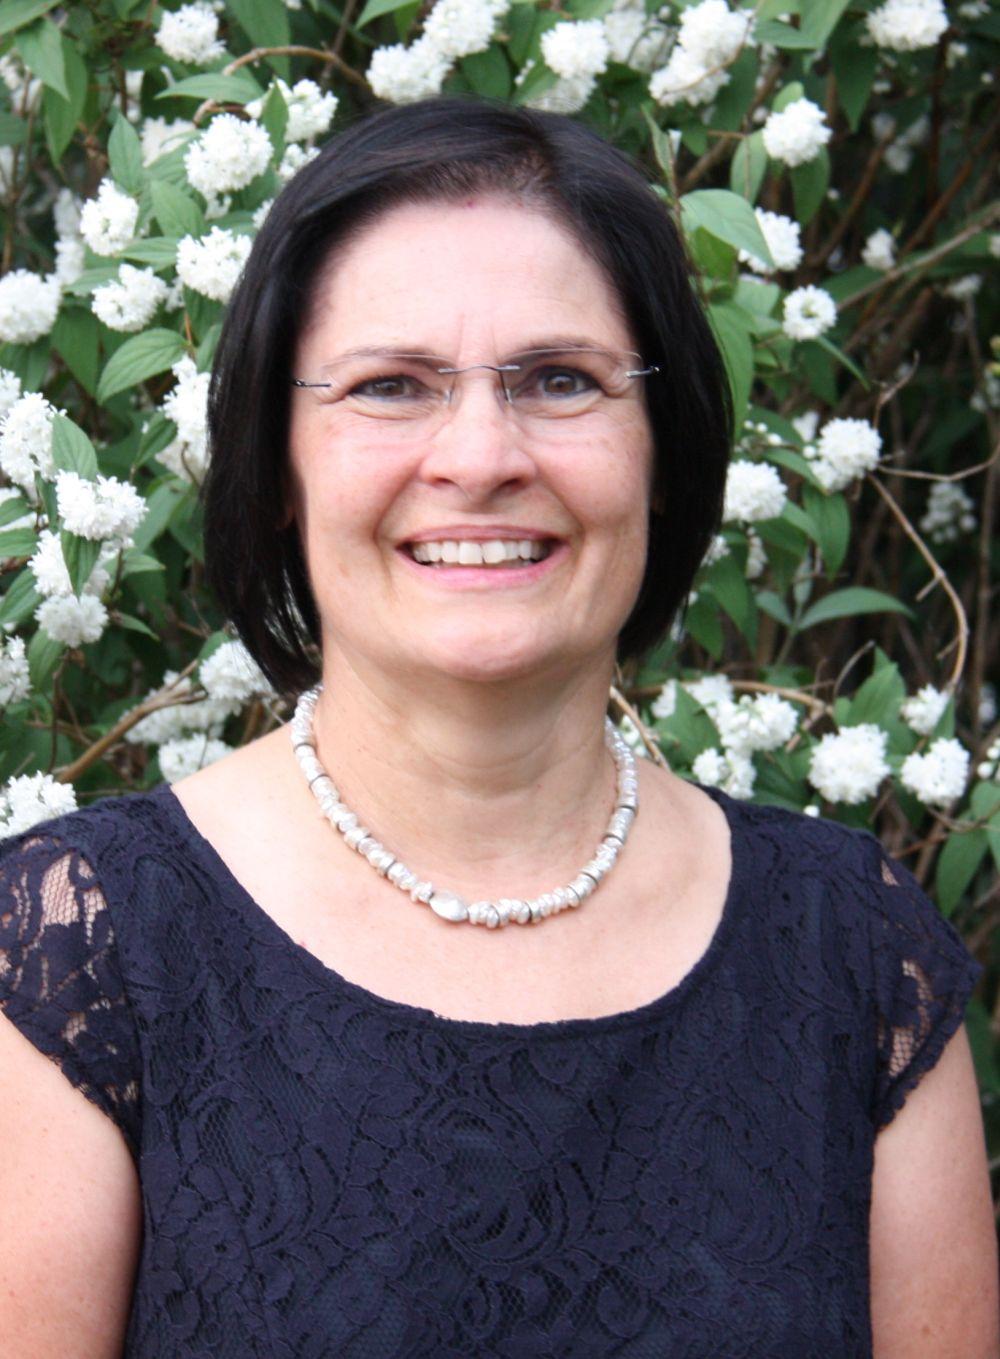 Vera Finn, 2. Vorsitzende